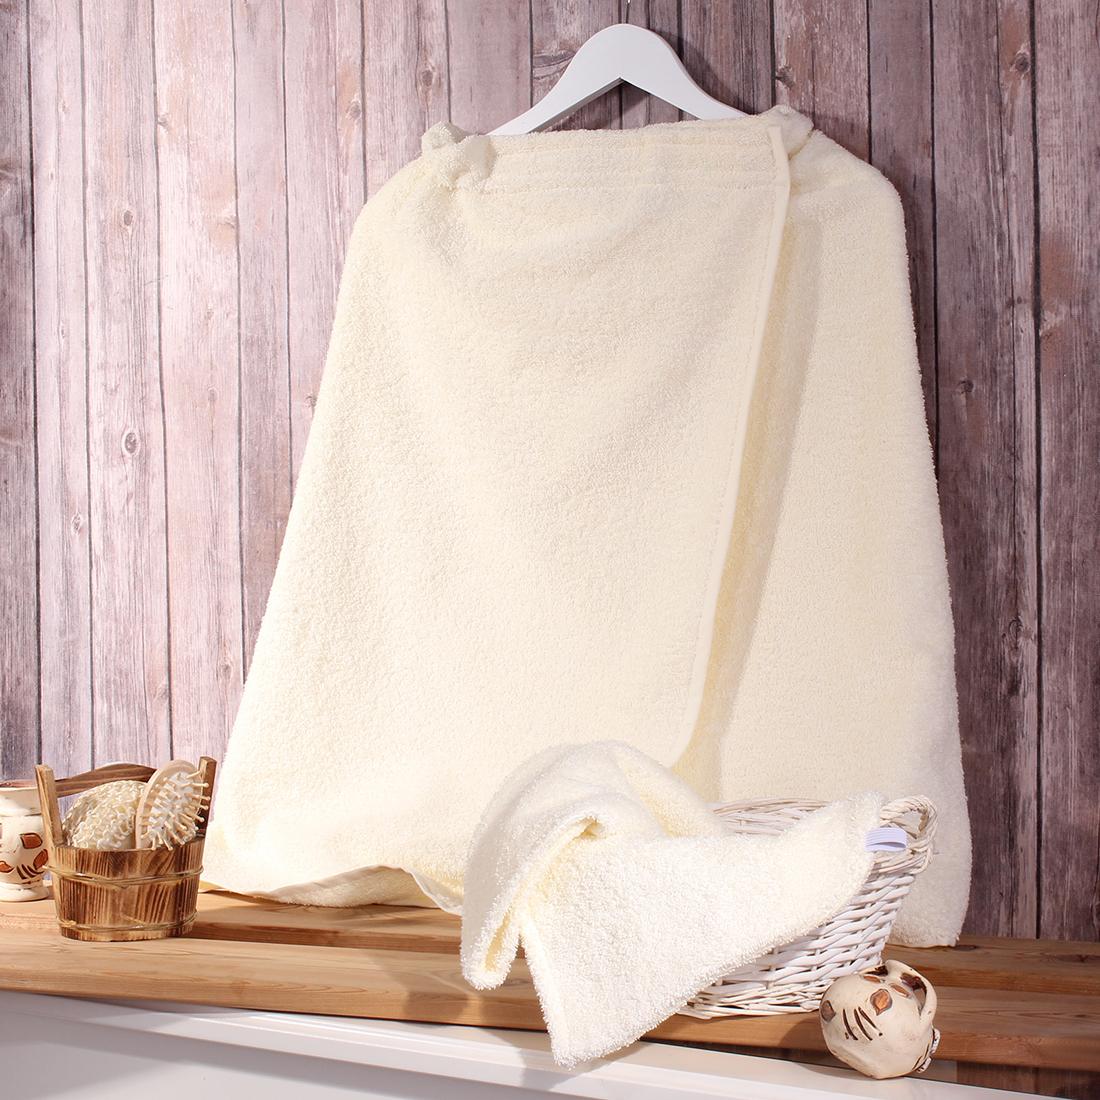 Комплект для бани Dome  Harmonika , цвет: молочный, 2 предмета. dme333633 -  Баня, сауна